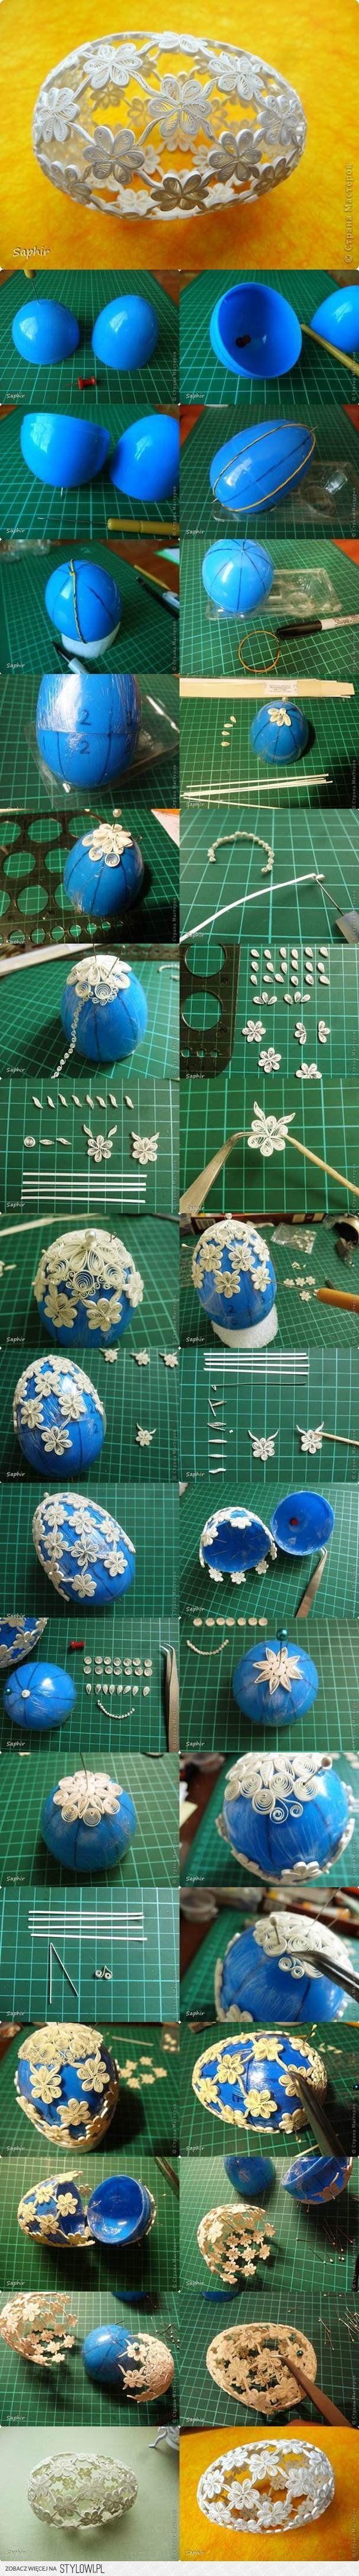 DIY Quilling Flowers Easter Egg   iCreativeIdeas.com